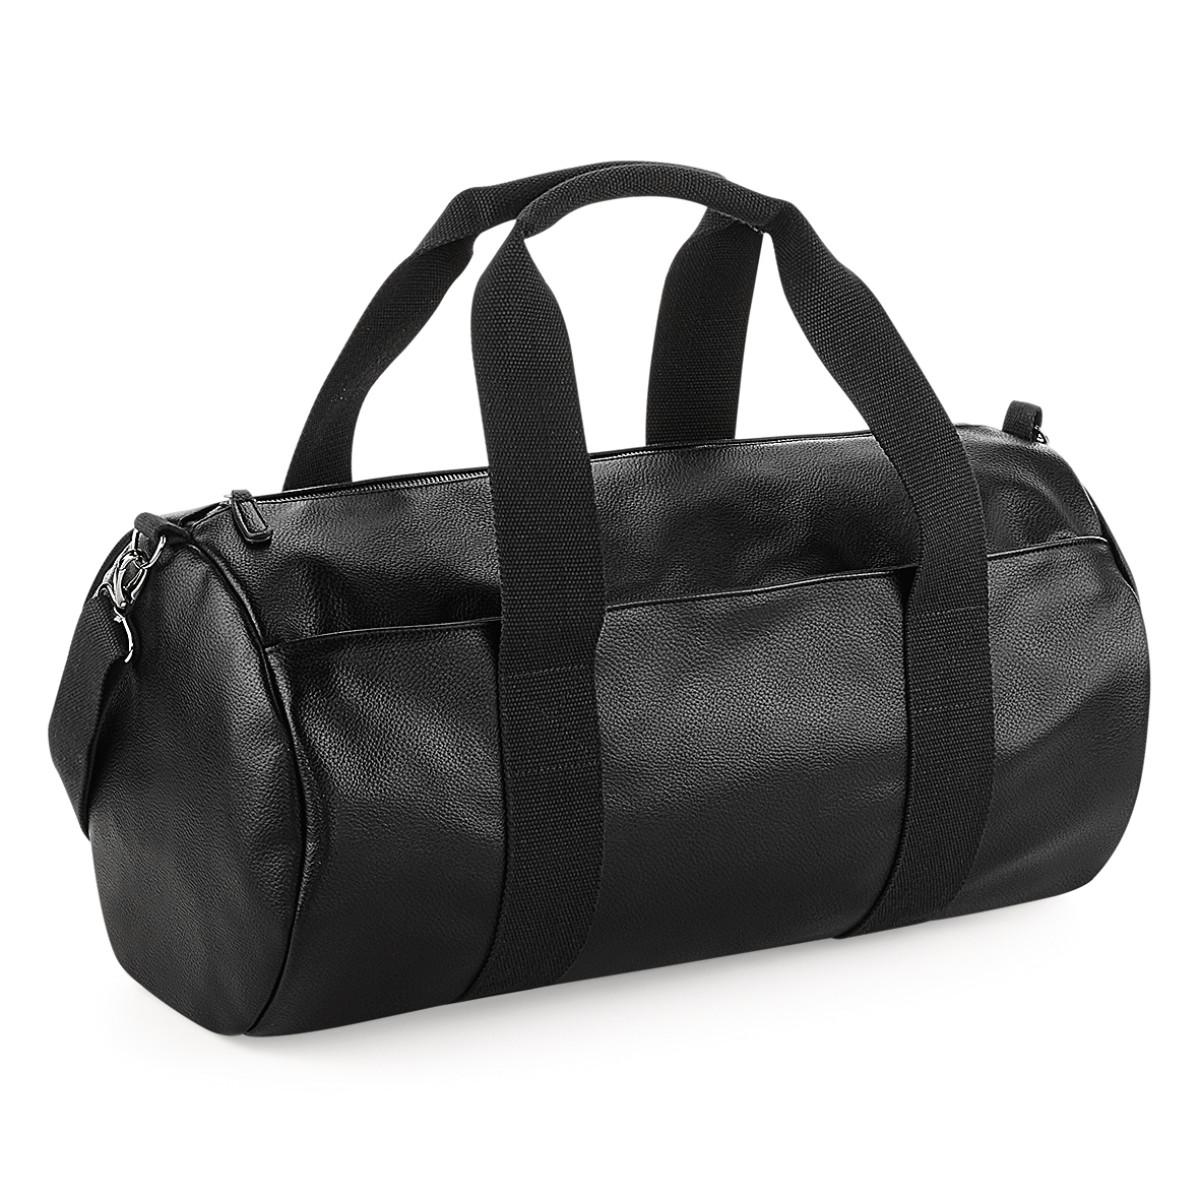 Bagbase Faux Leather Barrel Bag